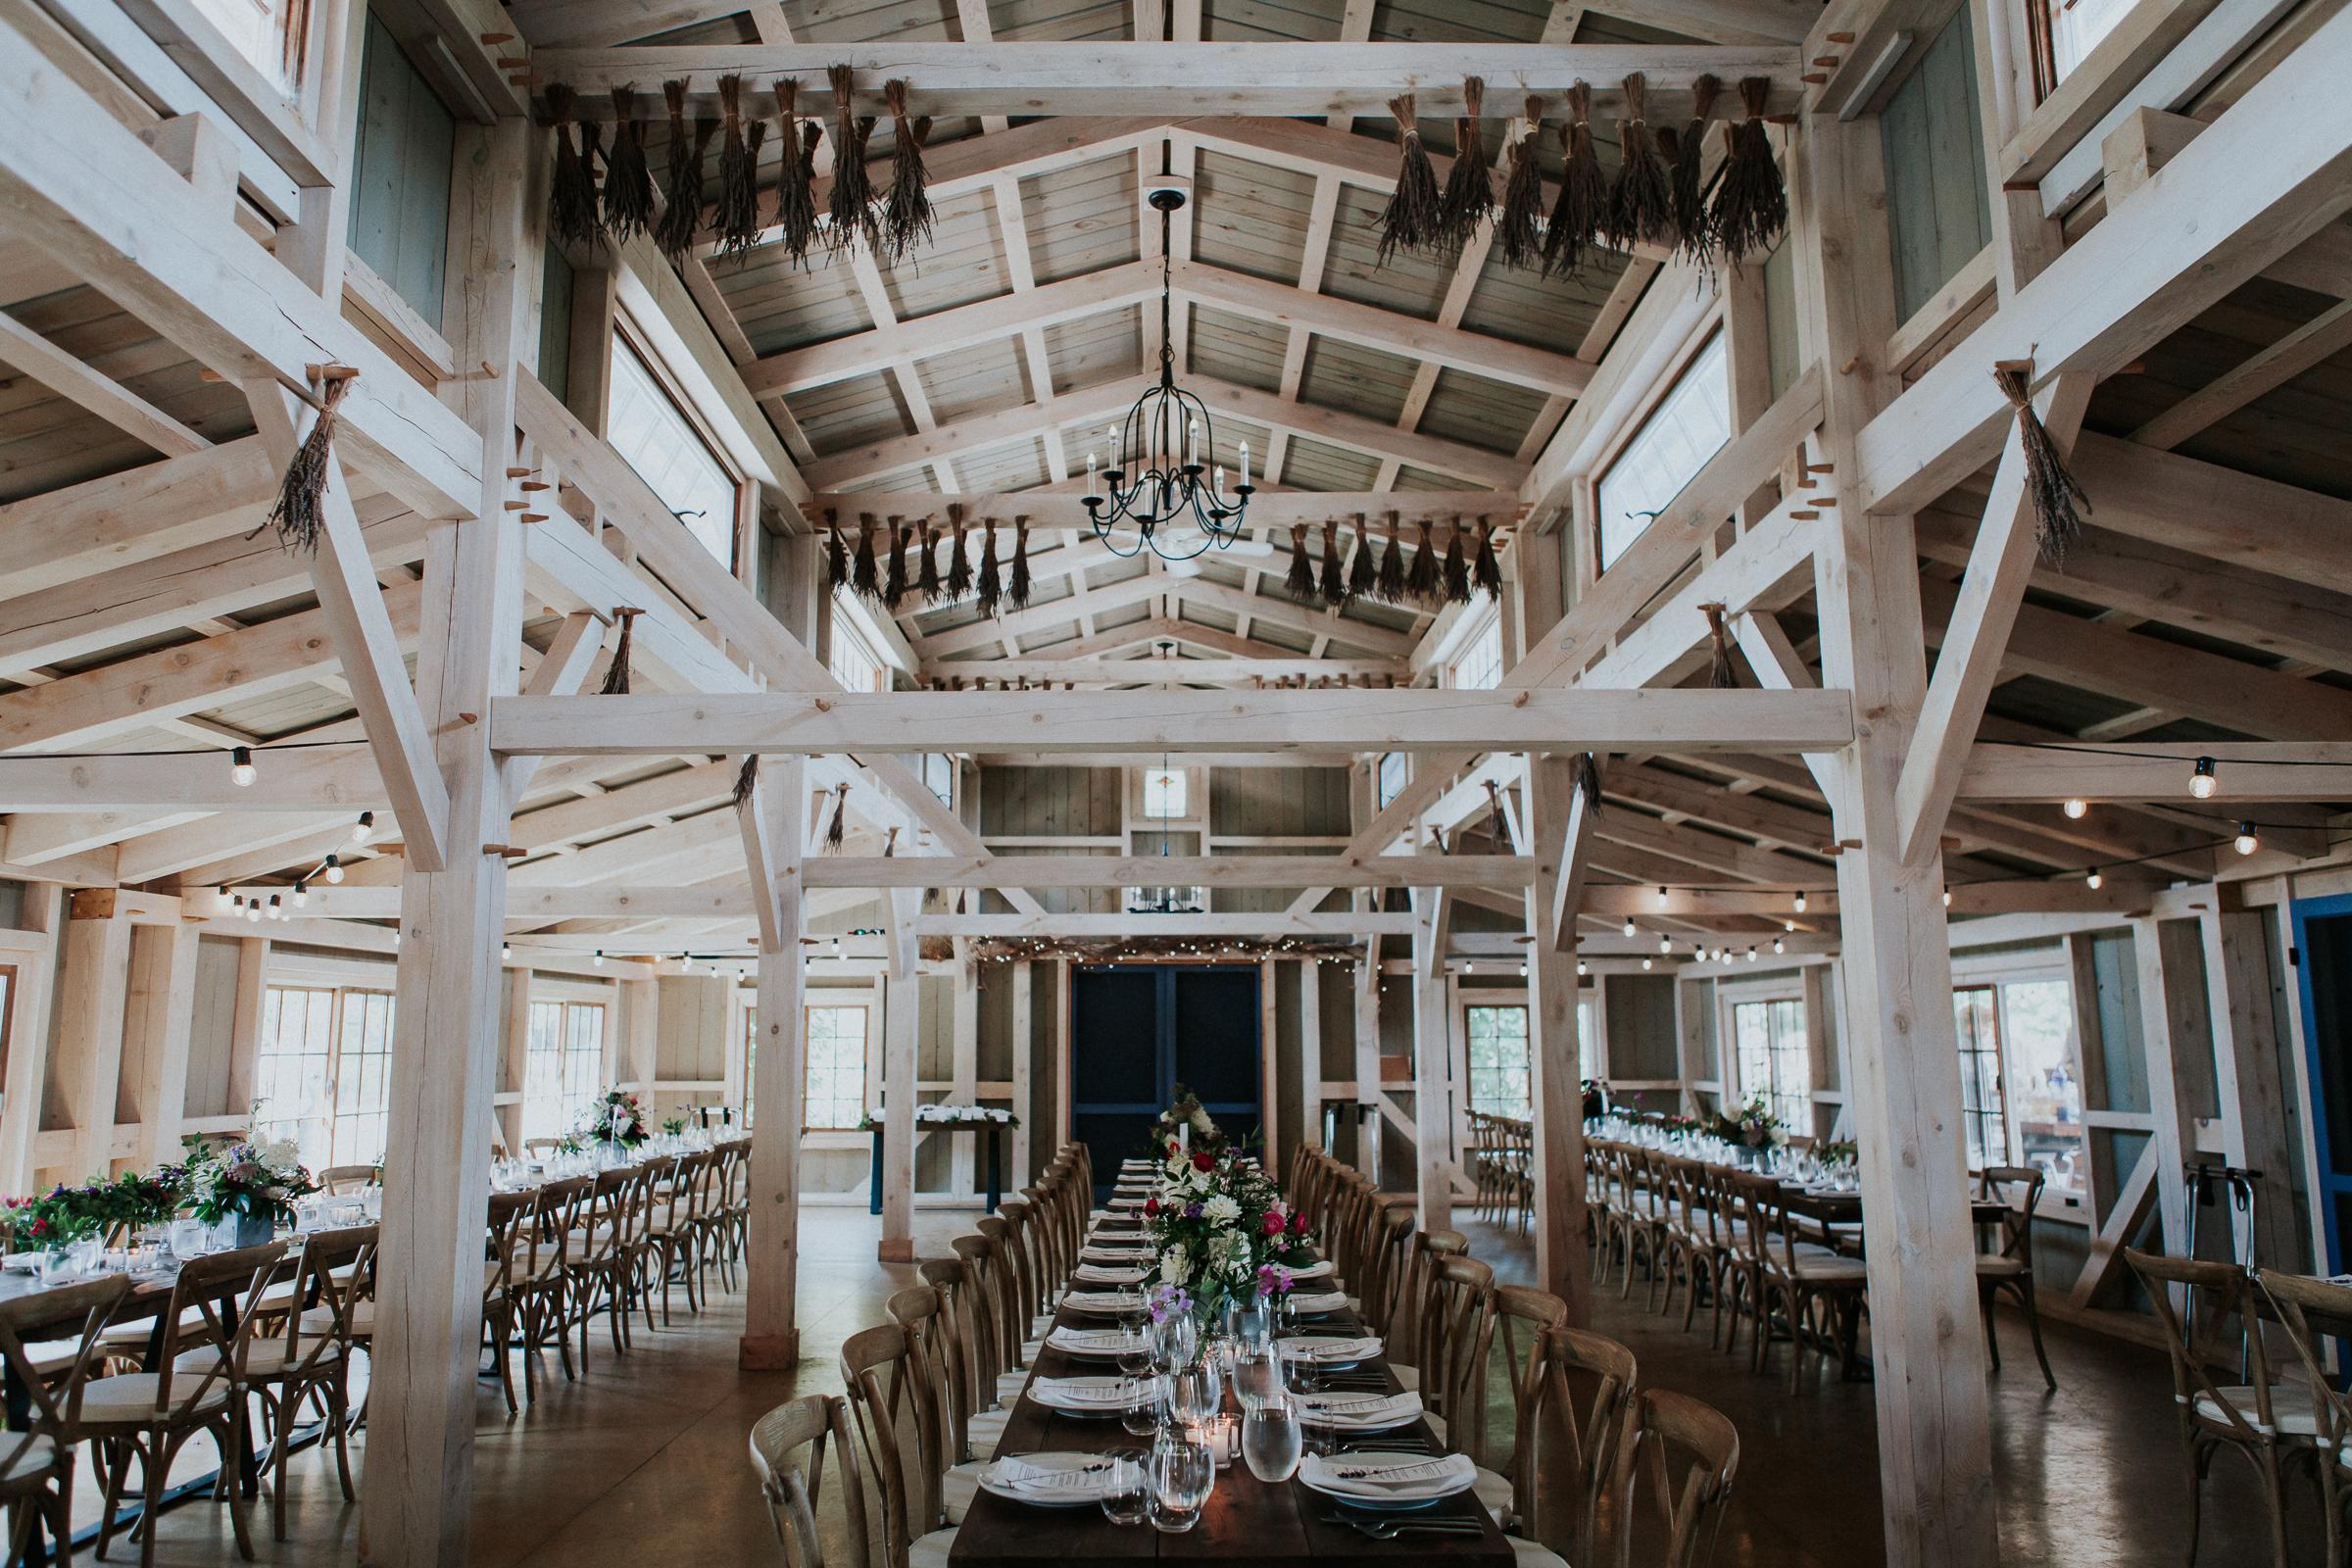 Marianmade-Farm-Wiscasset-Maine-Fine-Art-Documentary-Wedding-Photographer-Elvira-Kalviste-Photography-89.jpg